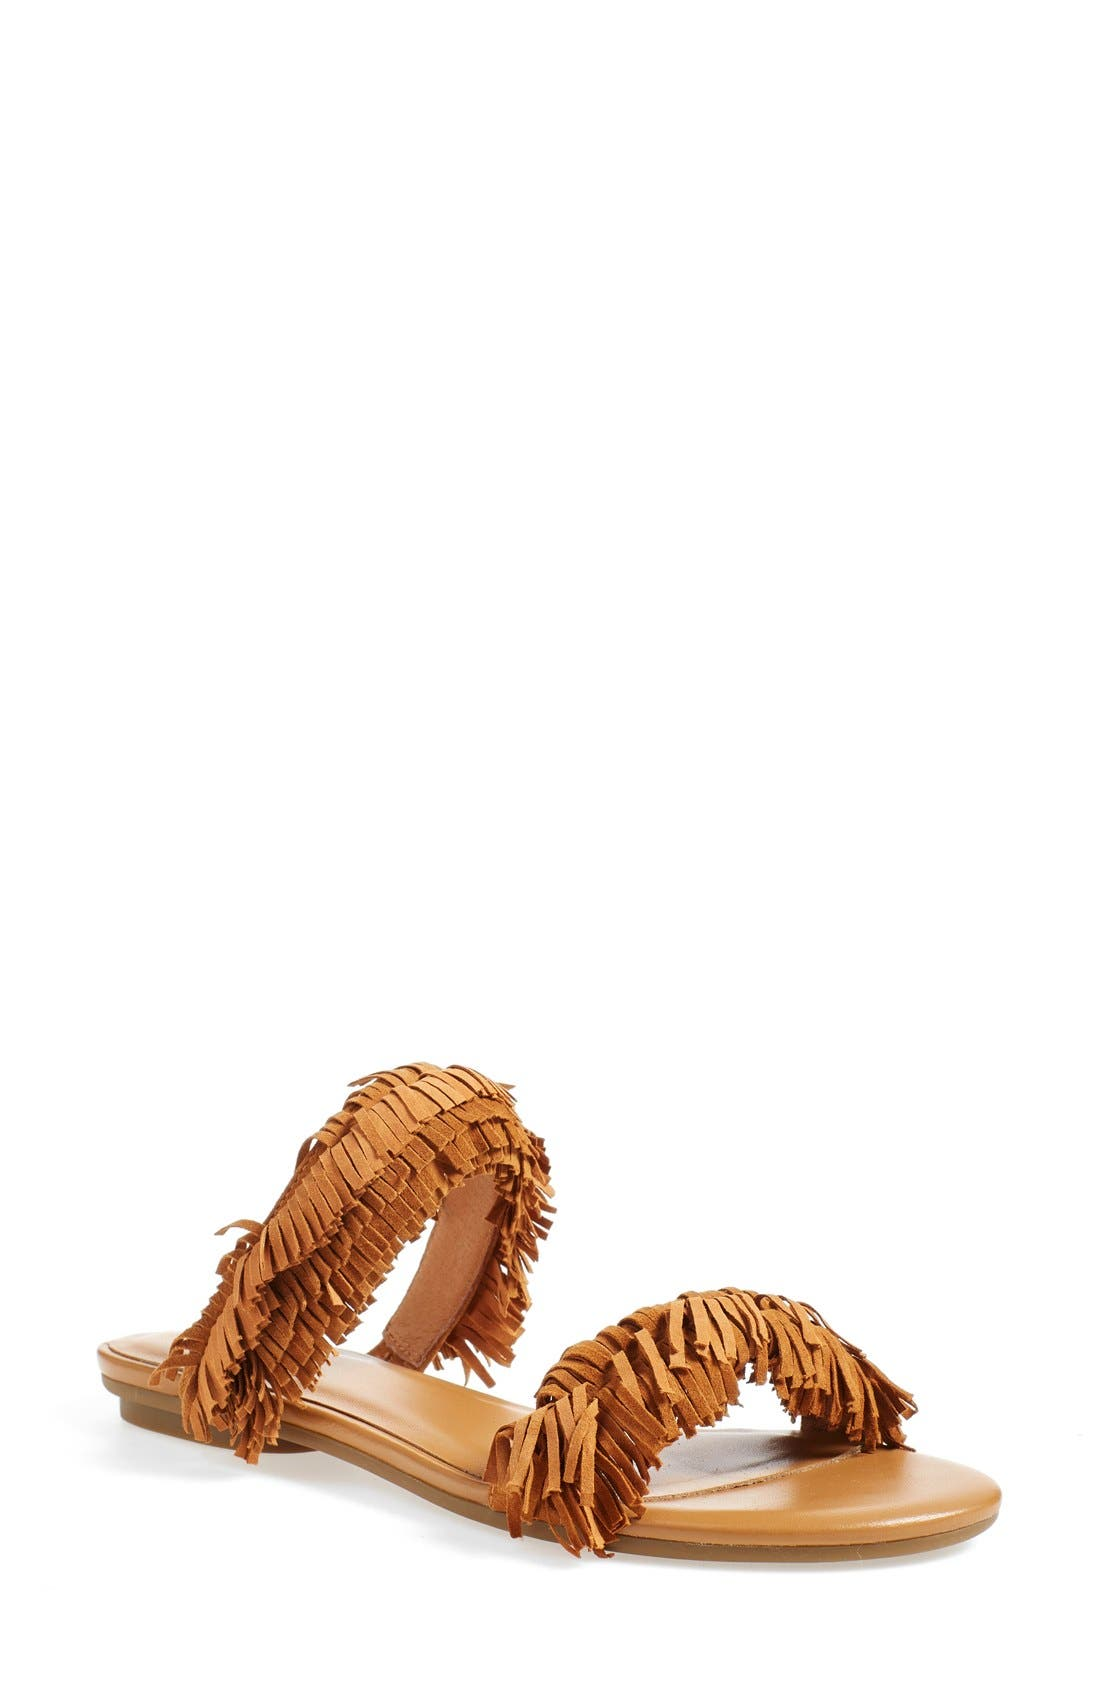 'Pippa' Fringe Slide Sandal,                             Main thumbnail 1, color,                             229